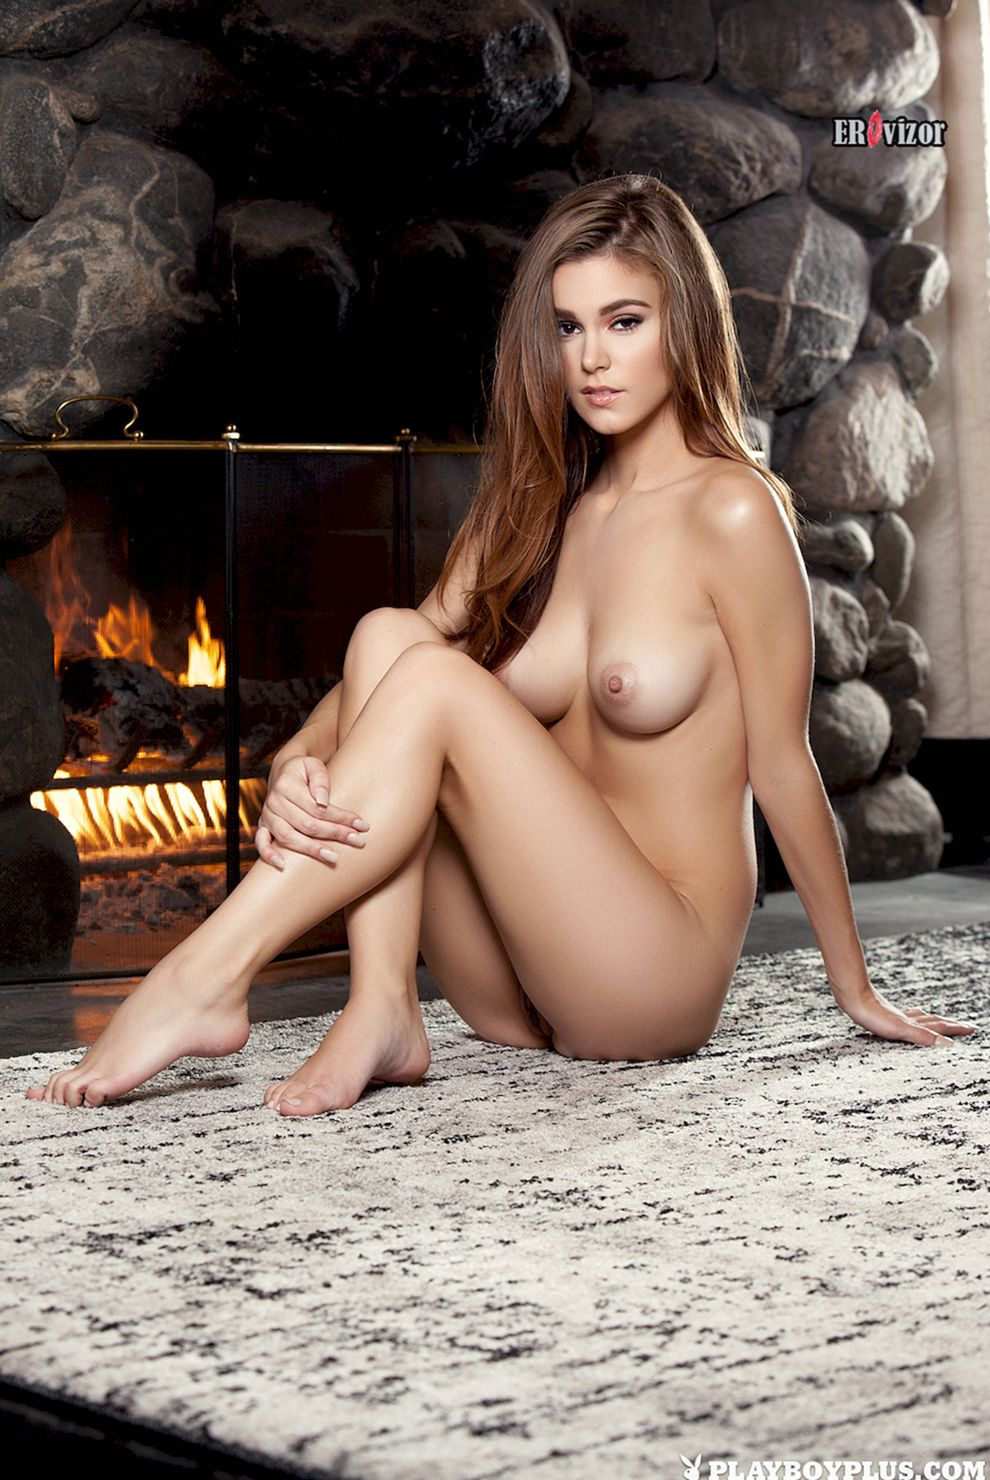 сексуальная голая модель сидя у камина